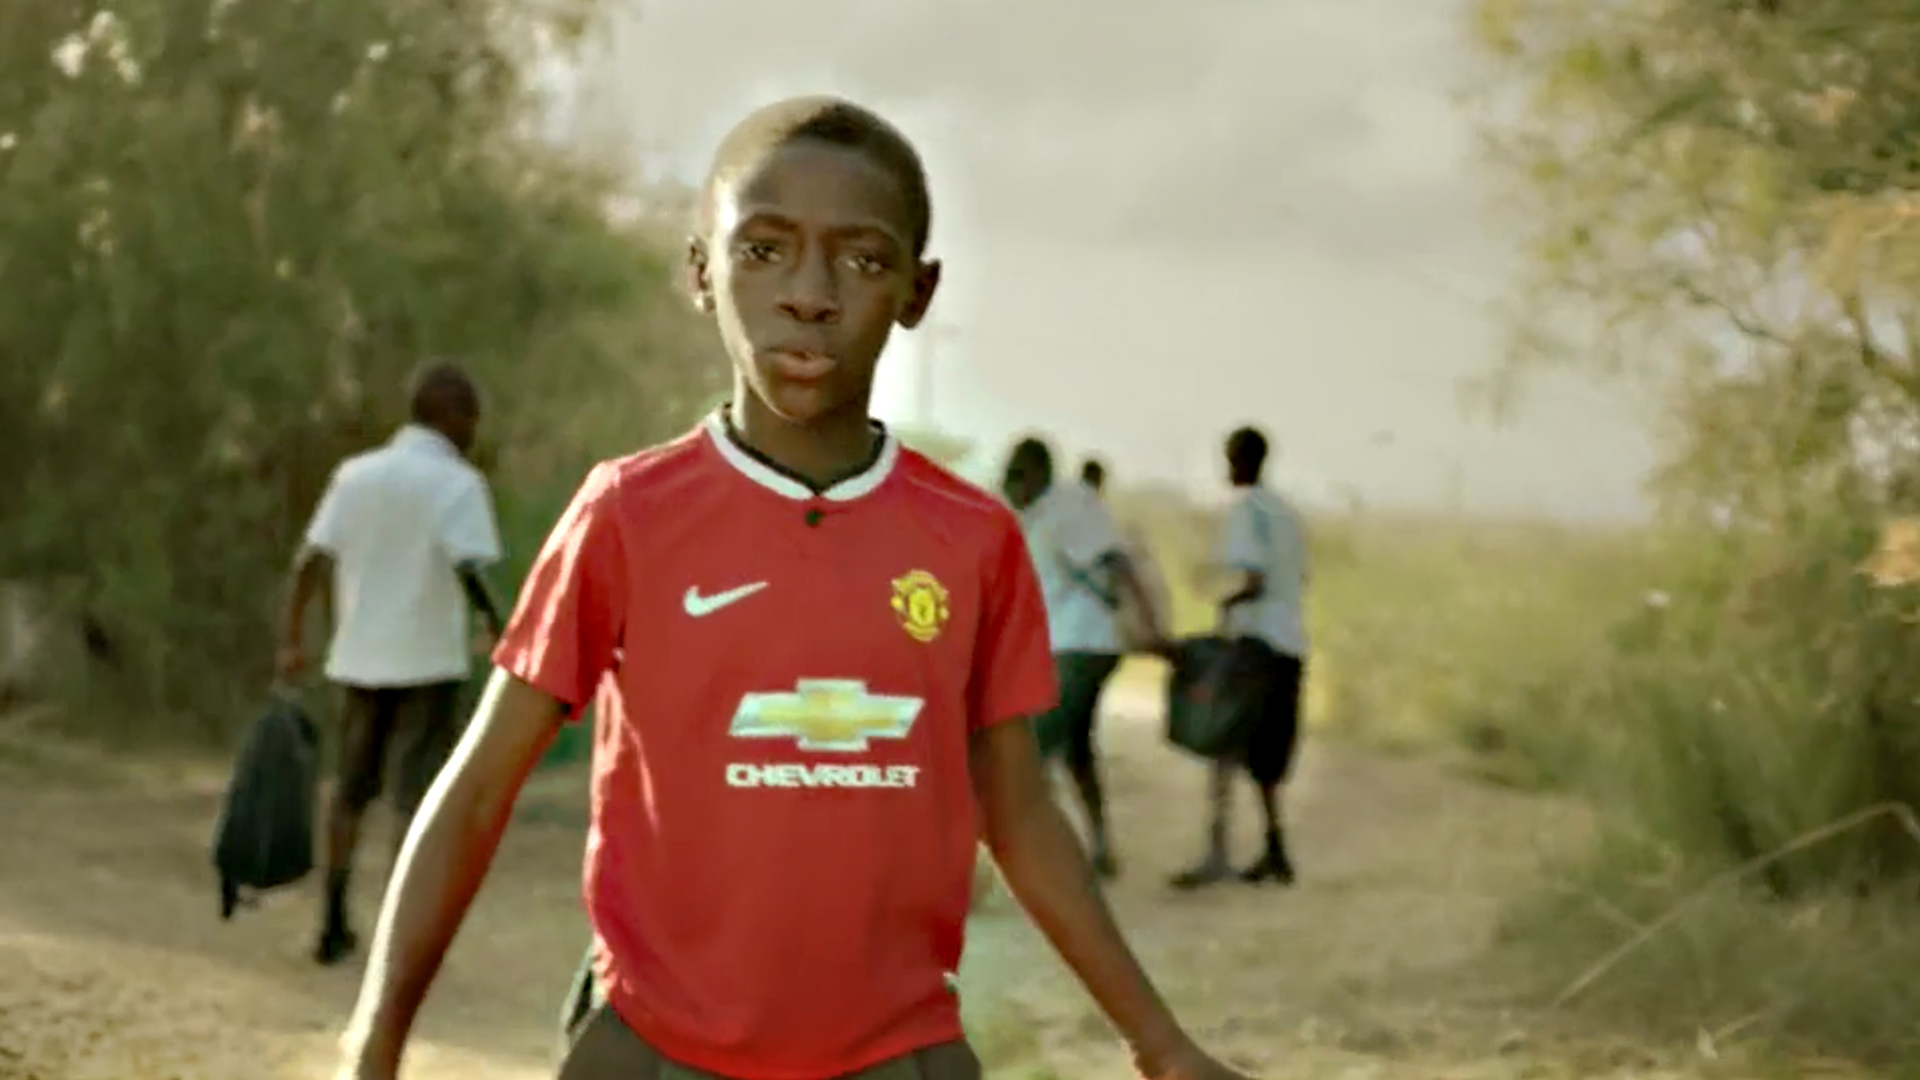 Chevrolet x Manchester United